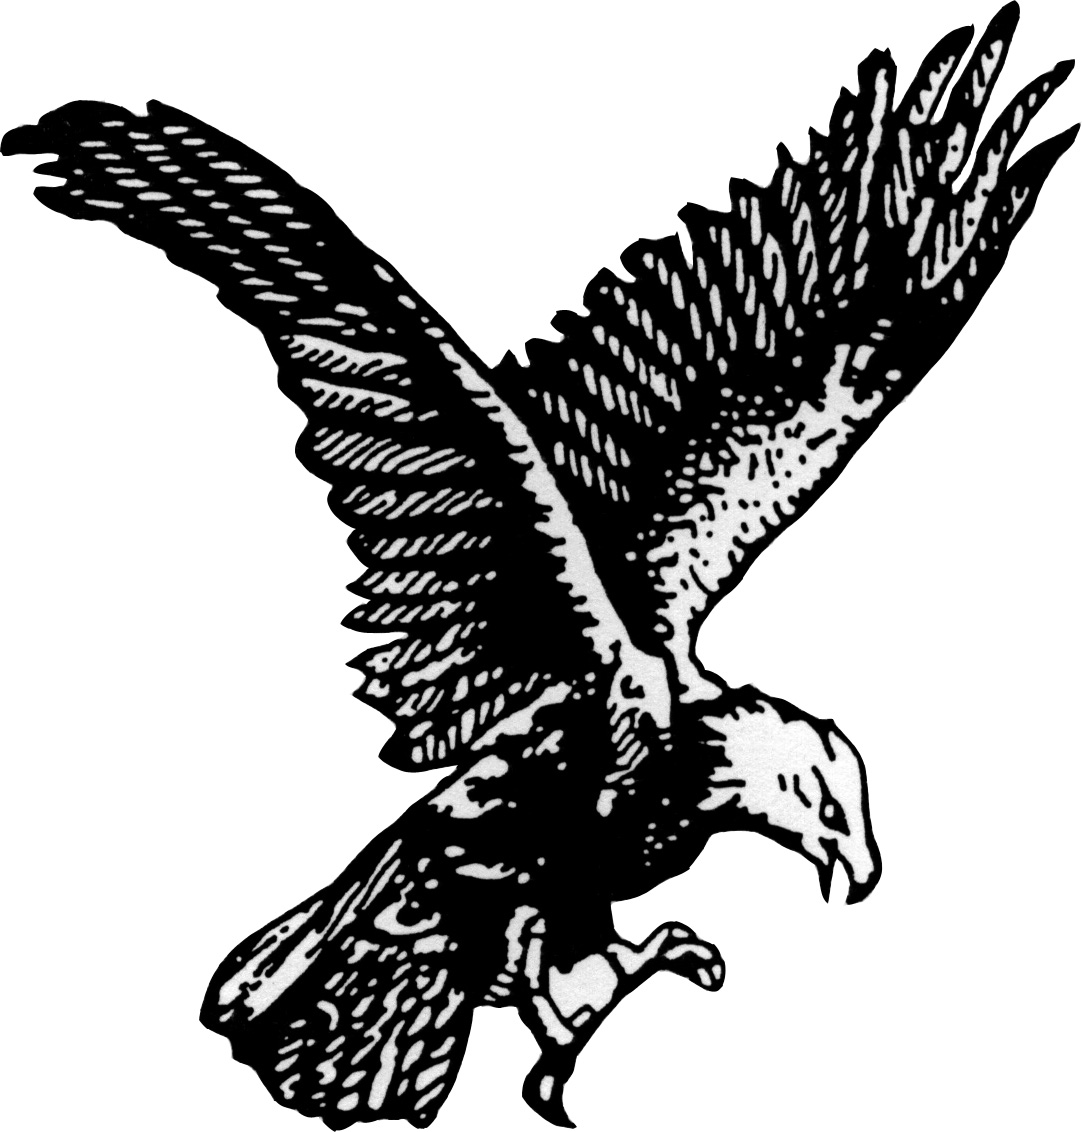 Black Eagle clipart soaring eagle Panda soaring%20eagle%20clipart Clipart Drawing Free